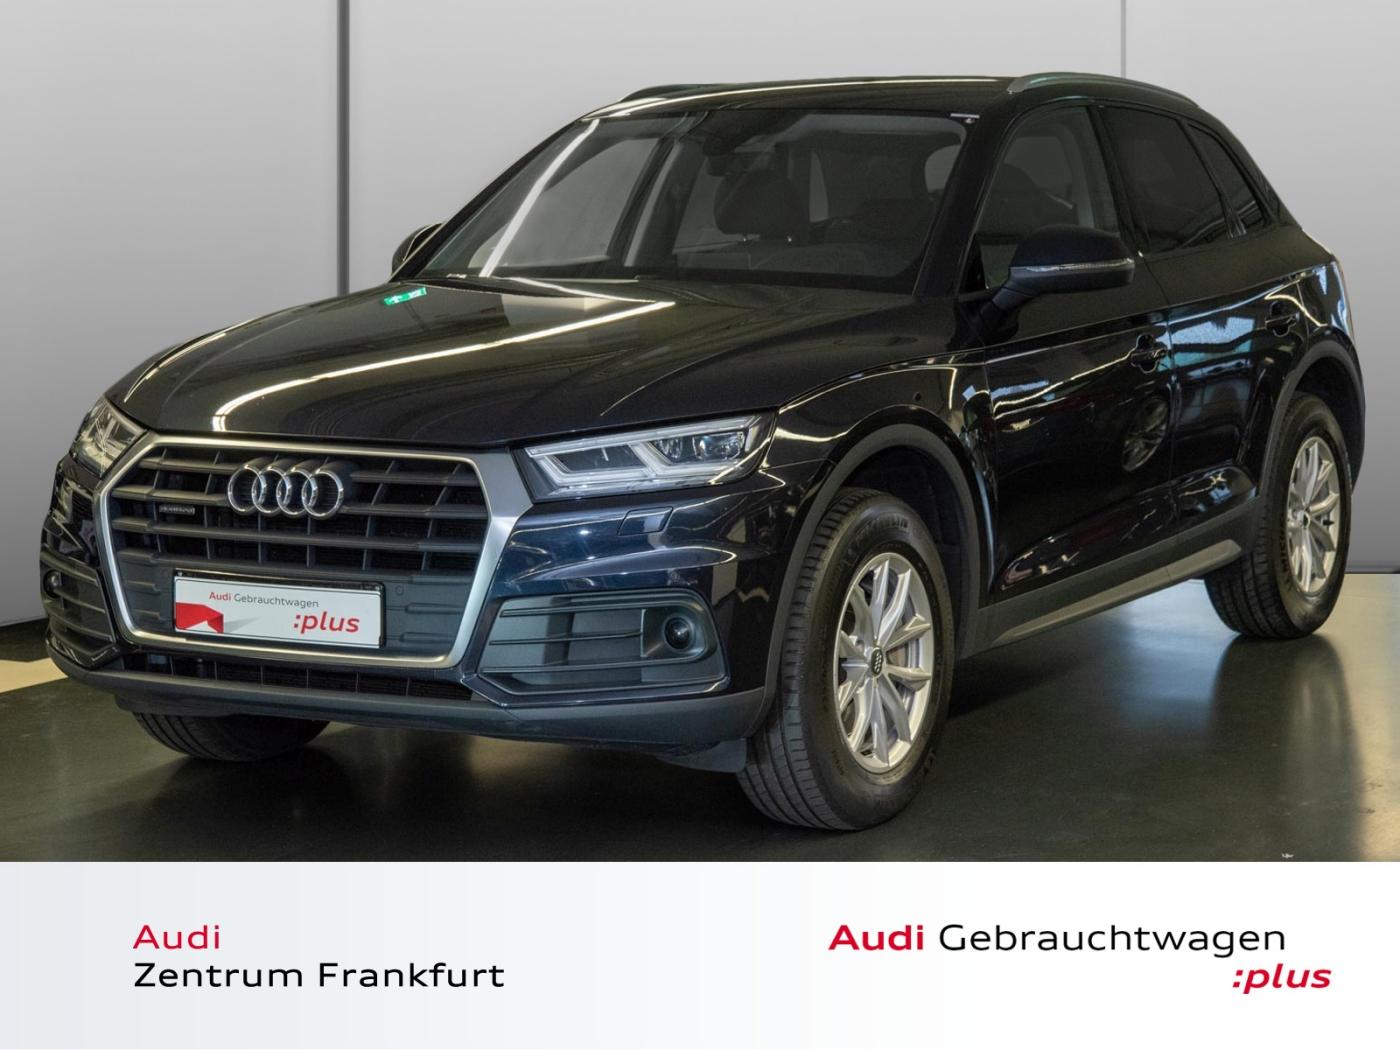 Audi Q5 2.0 TDI quattro S tronic Navi VirtualCockpit, Jahr 2017, Diesel